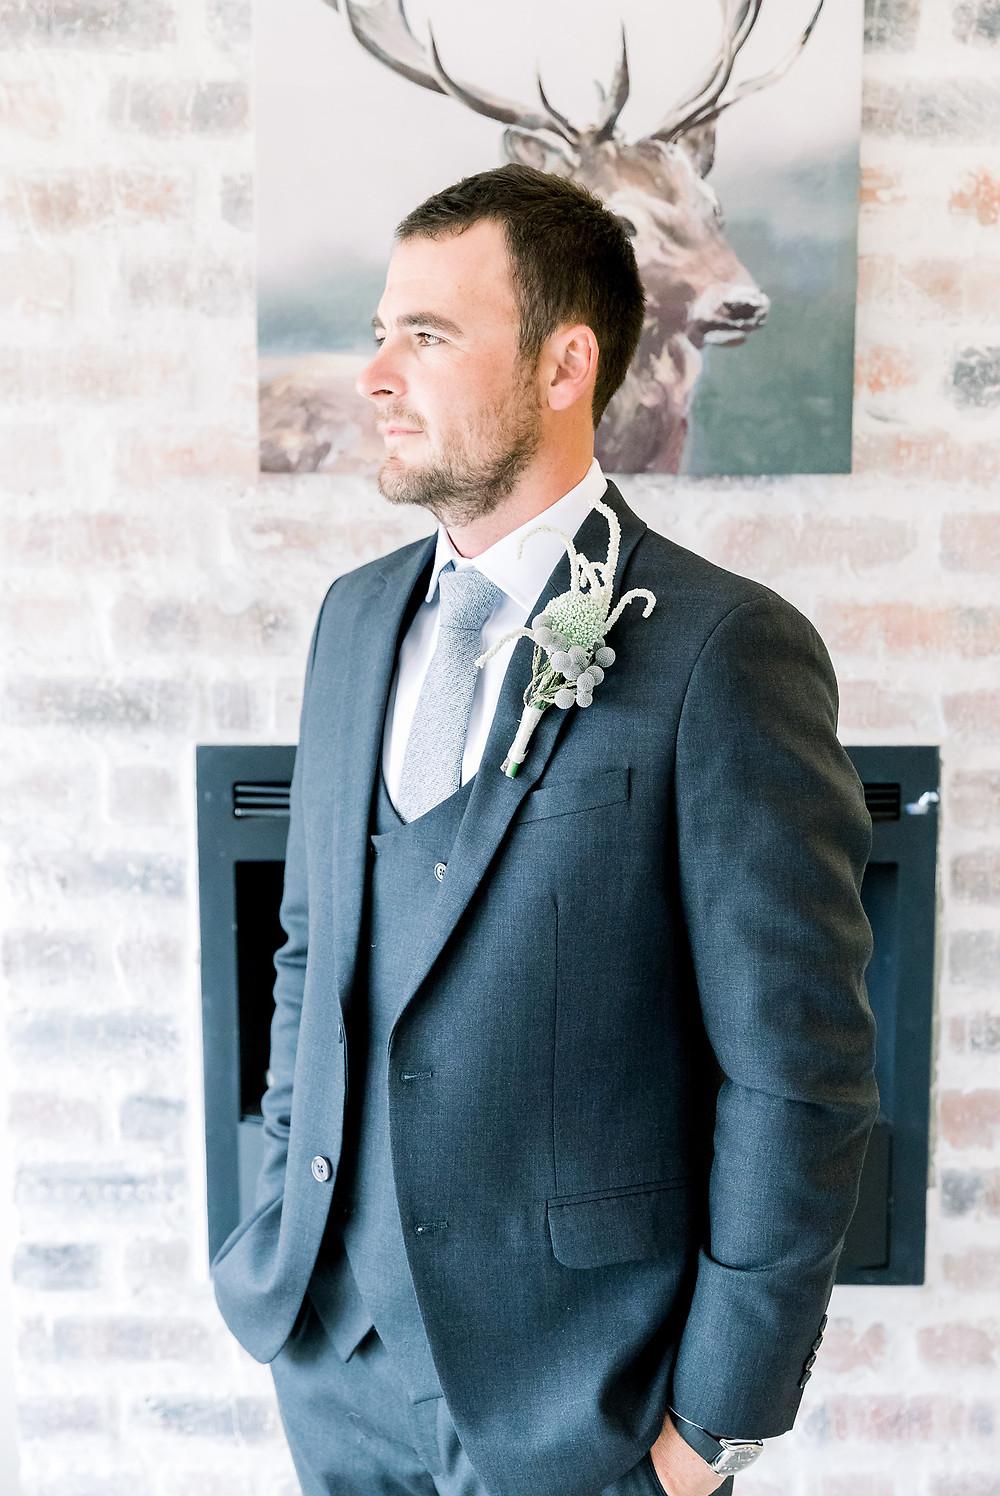 Pont de Val wedding, Pont de Val wedding photographer, Pont de Val, Destination wedding photographer, Parys wedding photographer, Parys weddings, Gauteng wedding photographer, Gauteng wedding photography, Pretoria wedding photographer, Wedding photographer